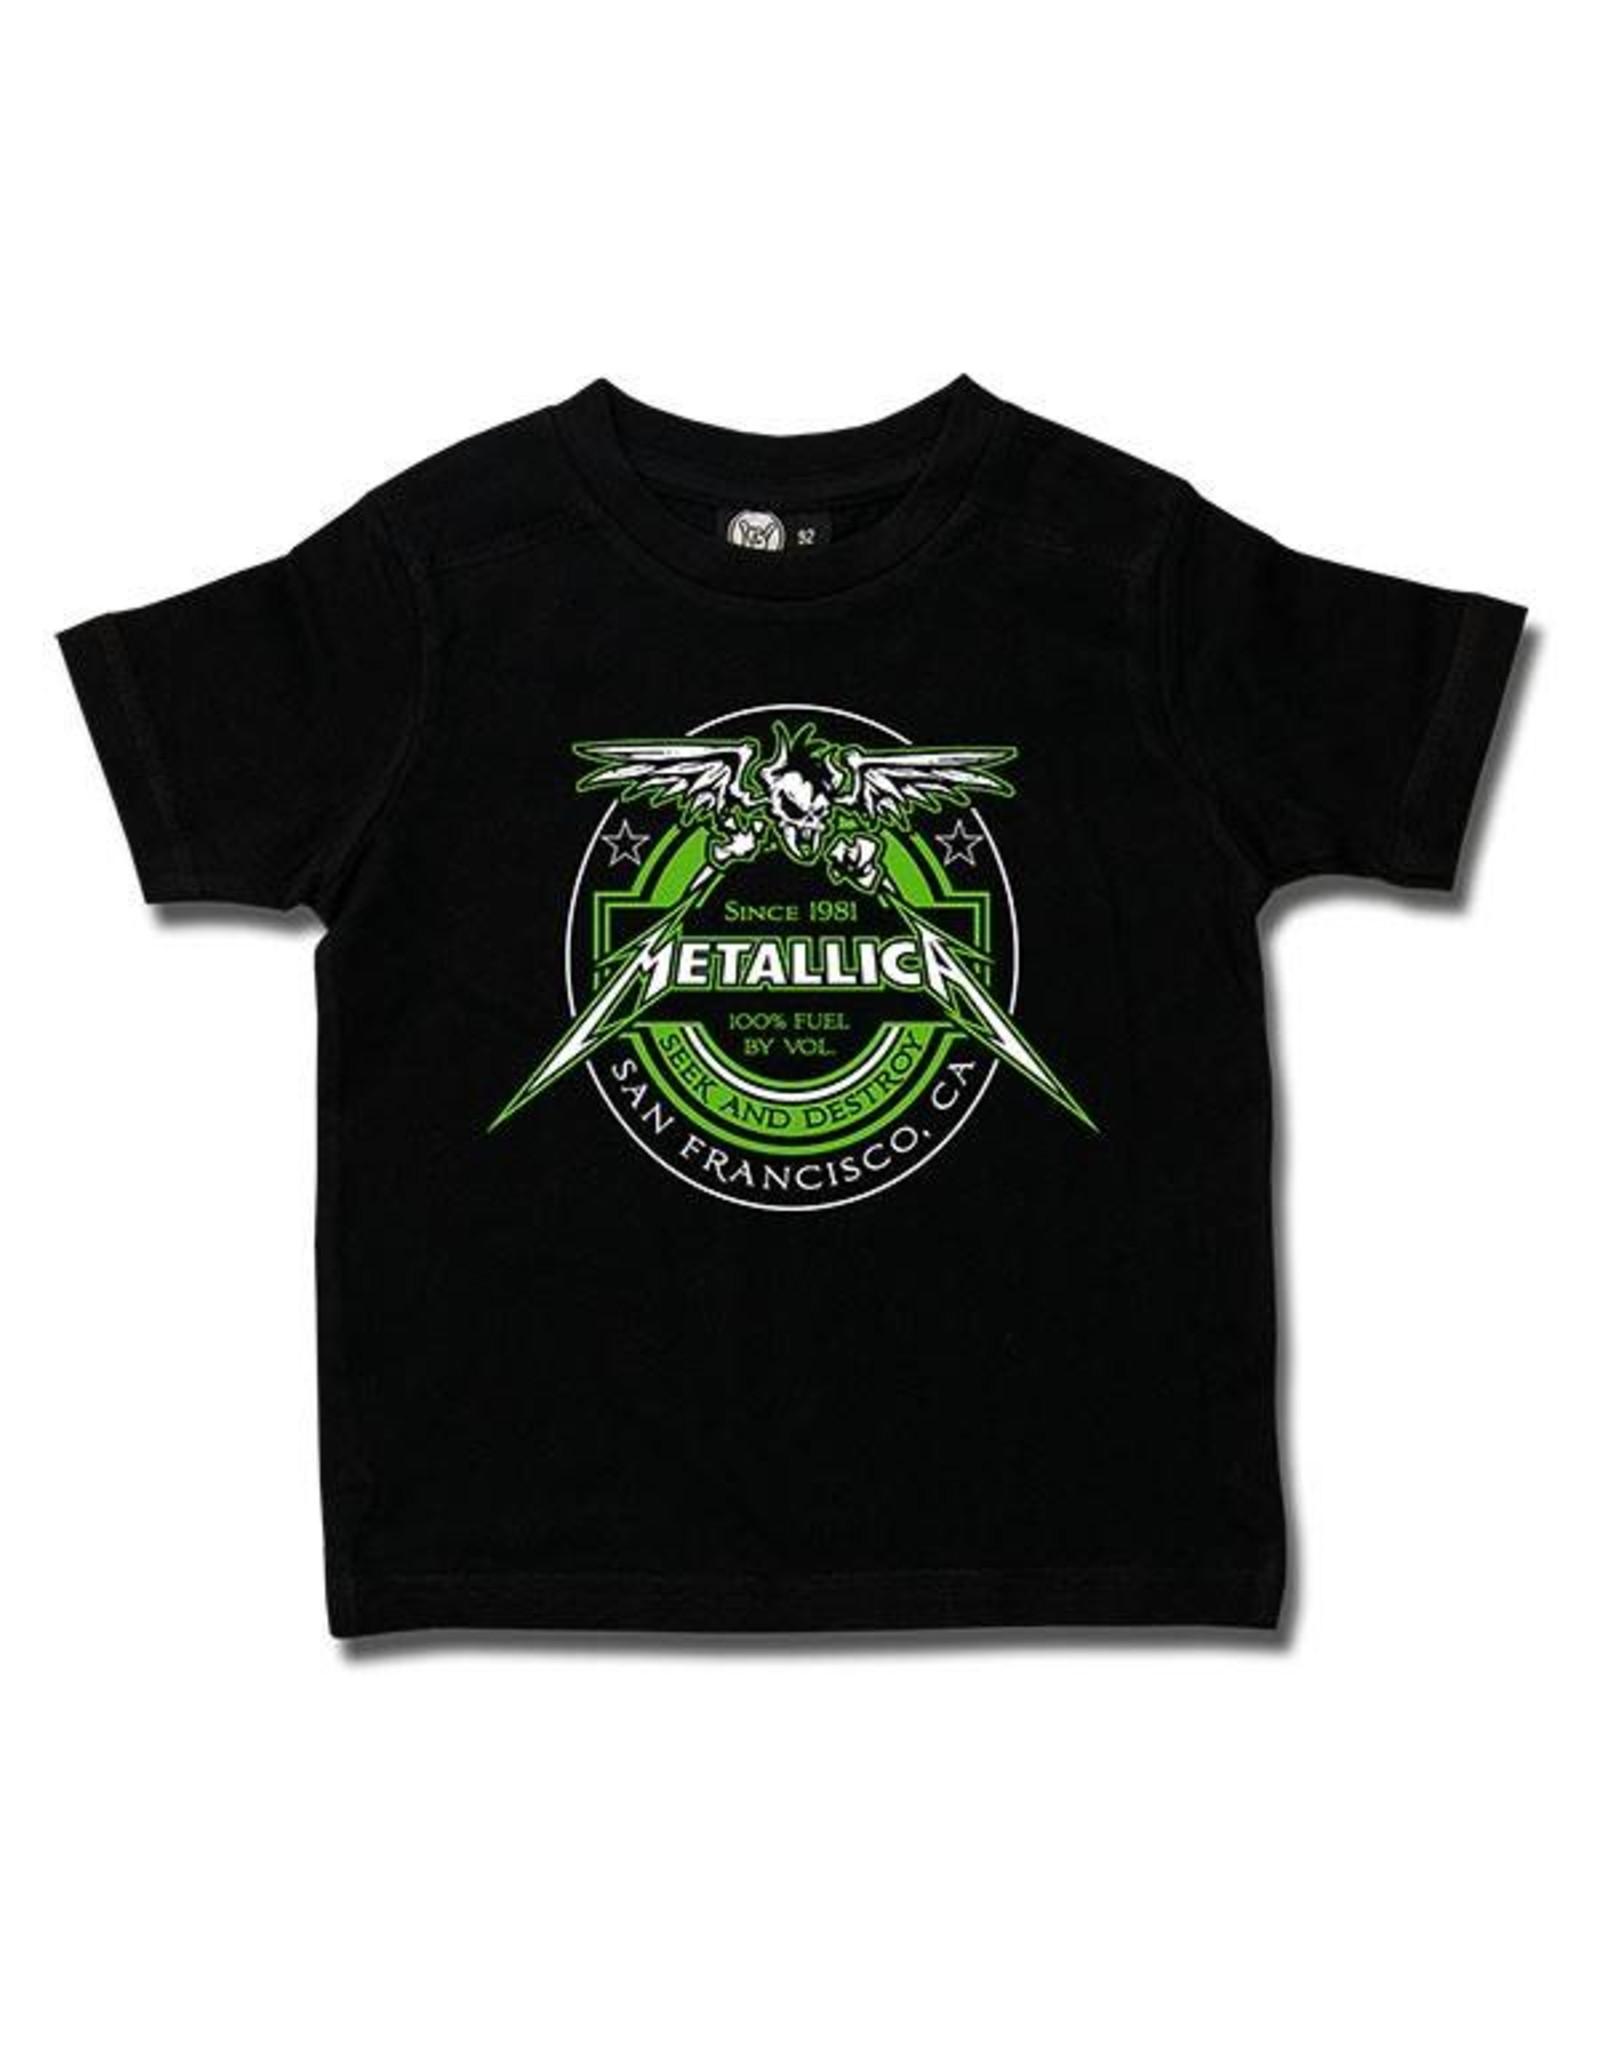 Metallica Metallica (Fuel) - Kids T-Shirt